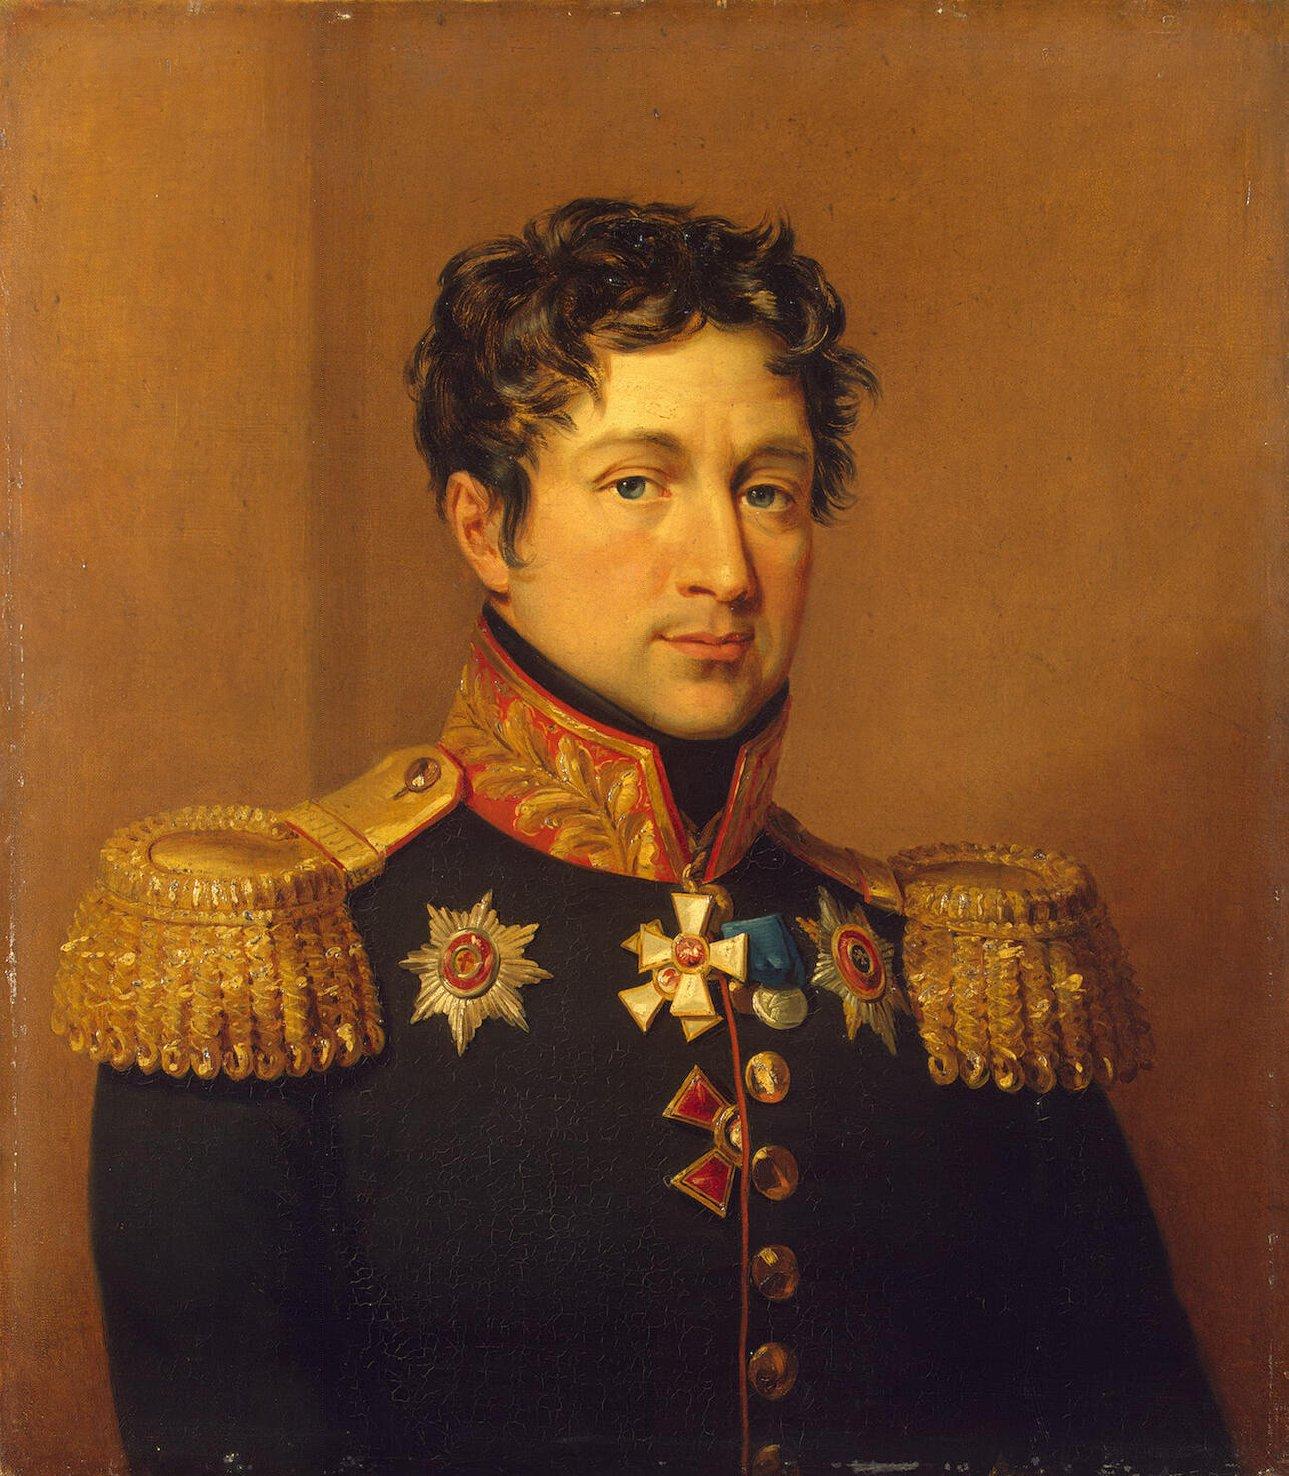 Олсуфьев, Захар Дмитриевич